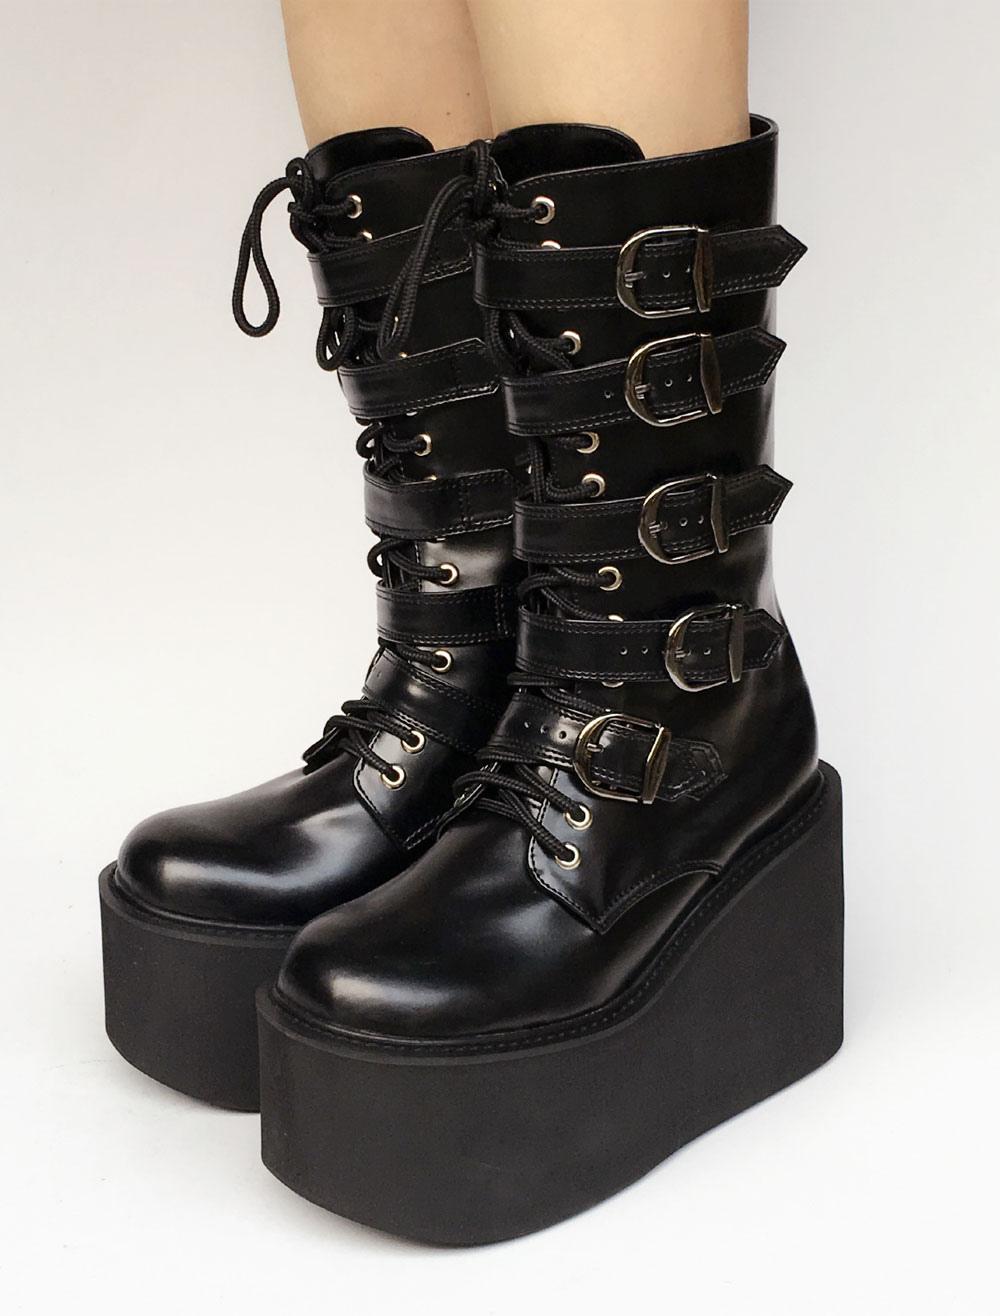 95b5edf8289 Lolitashow Lolita Platform Boots Black Wedge Buckle Lace Up Round Toe  Lolita Short Boots